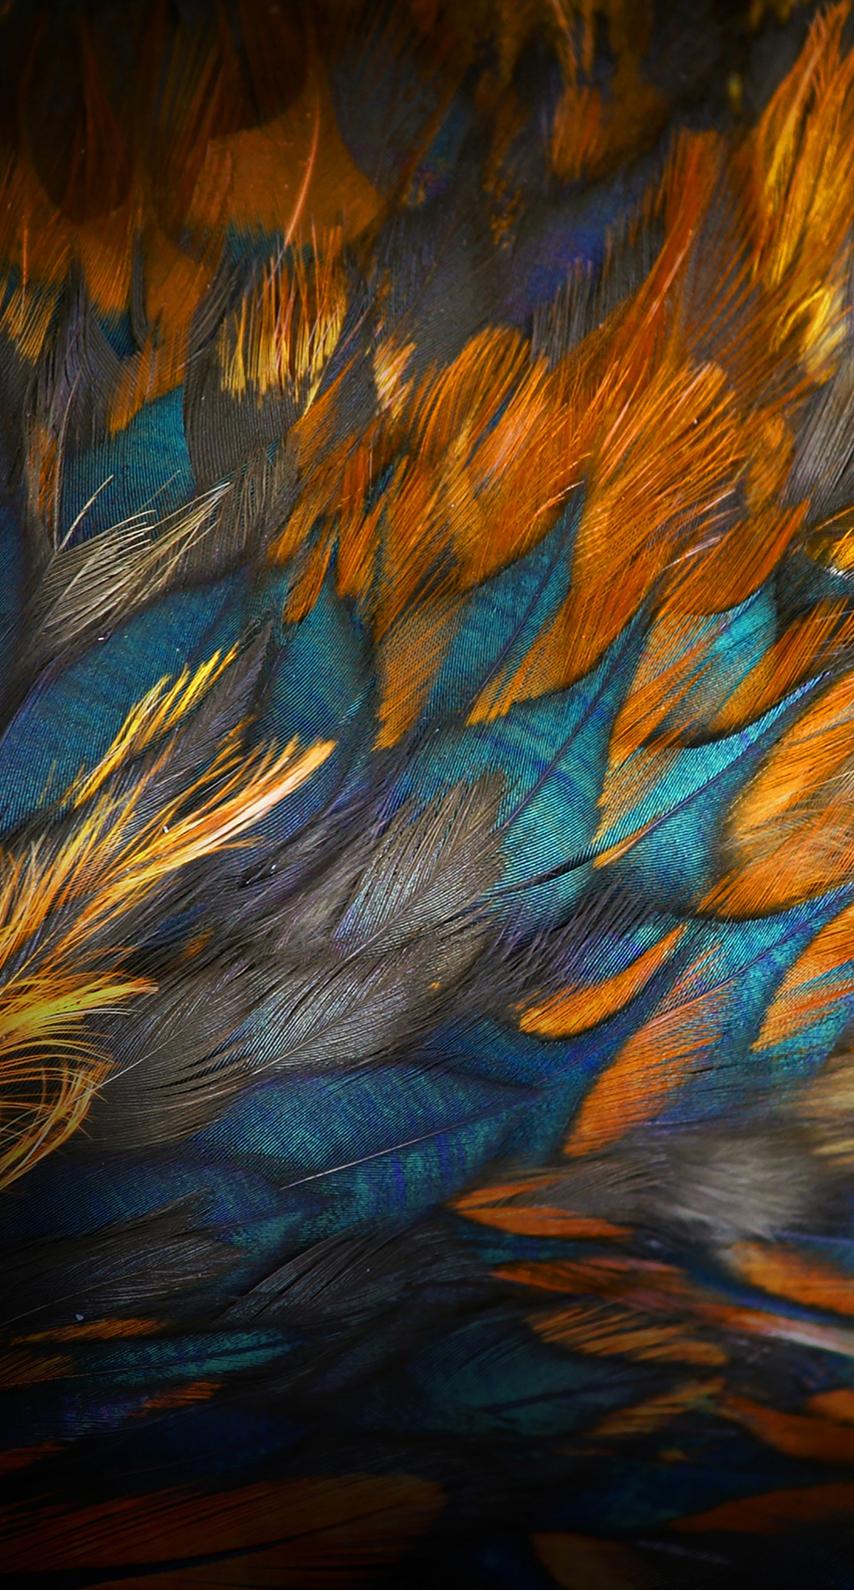 bird, texture, school, abstract, fall